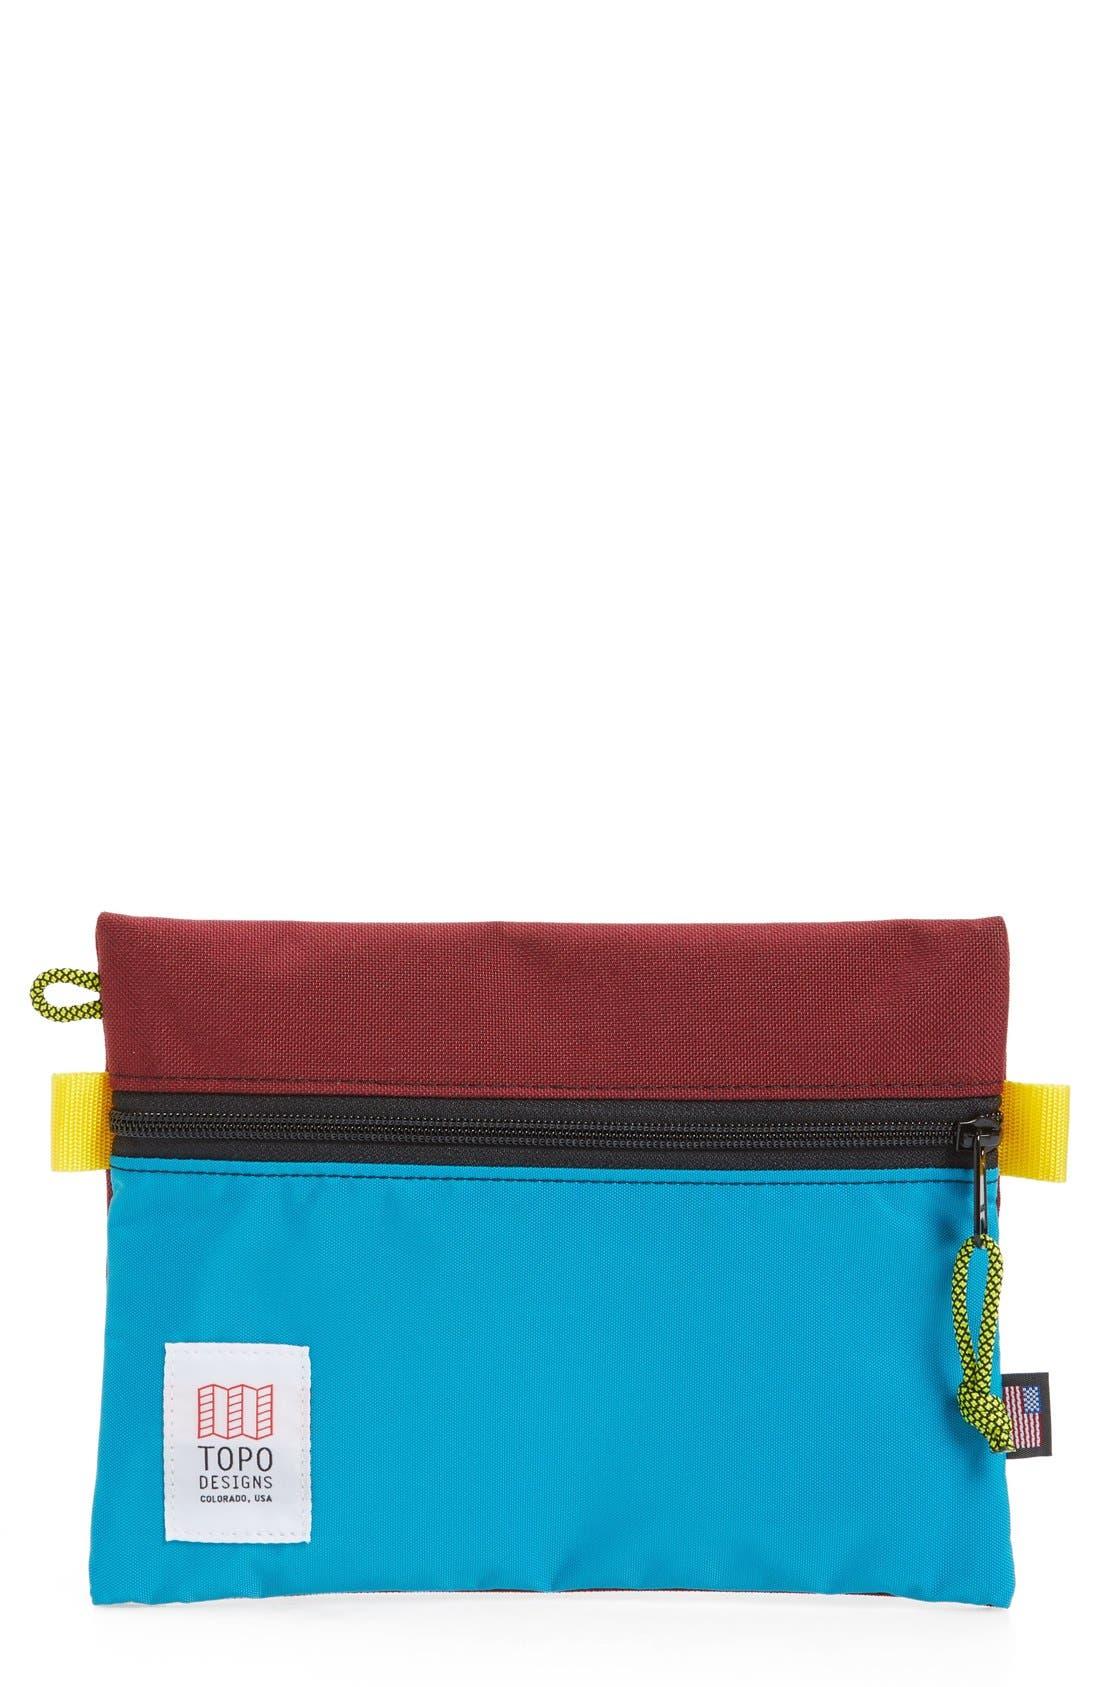 Main Image - TopoDesigns Accessory Bag